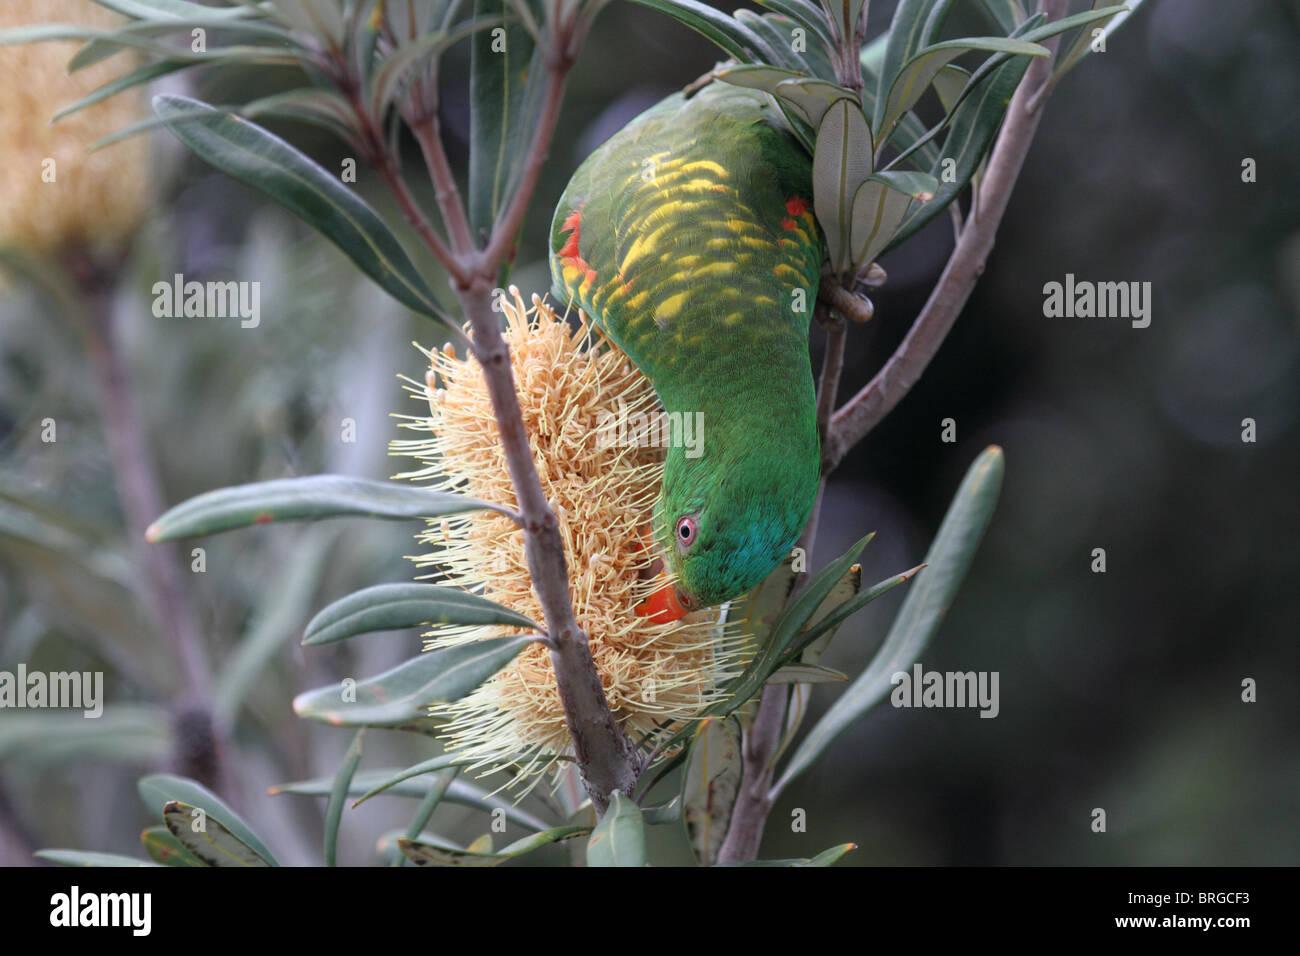 Scaly-breasted lorikeet feeding on banksia pollen - Stock Image